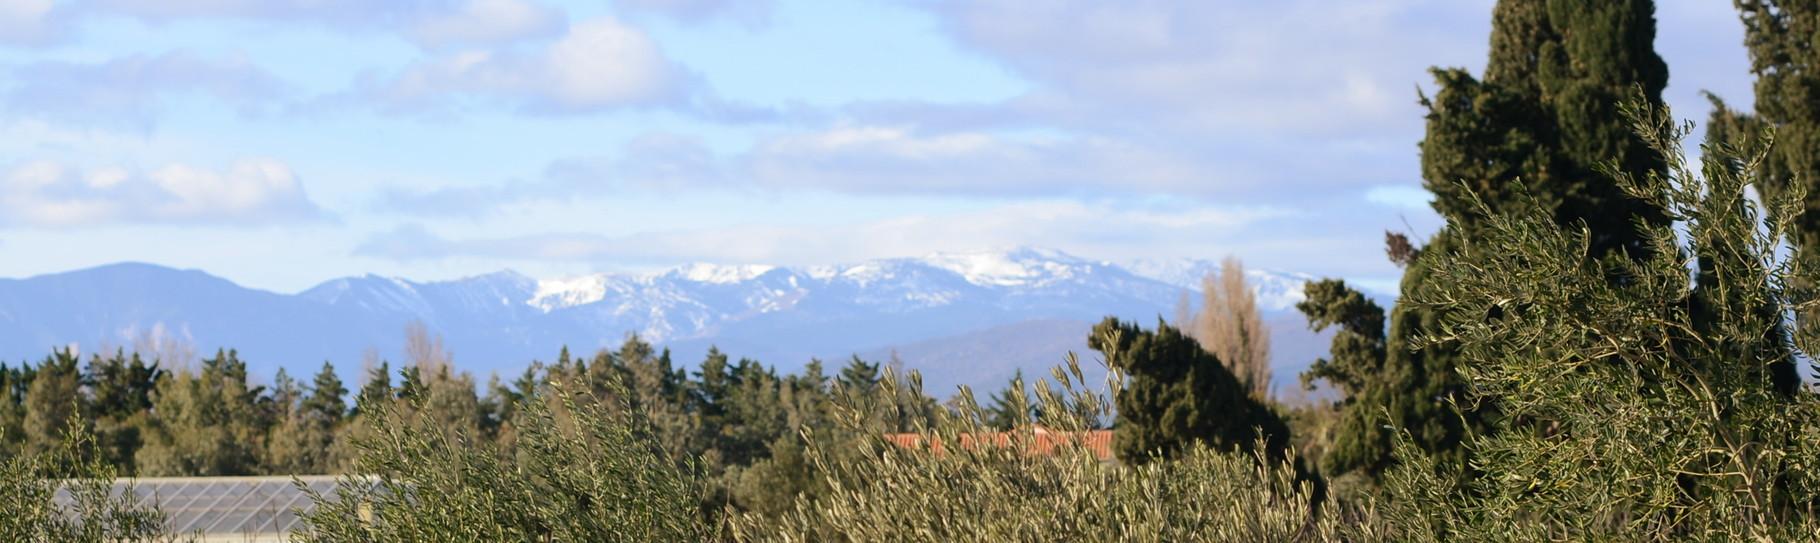 Massif du Carlit (Capcir), 20 décembre